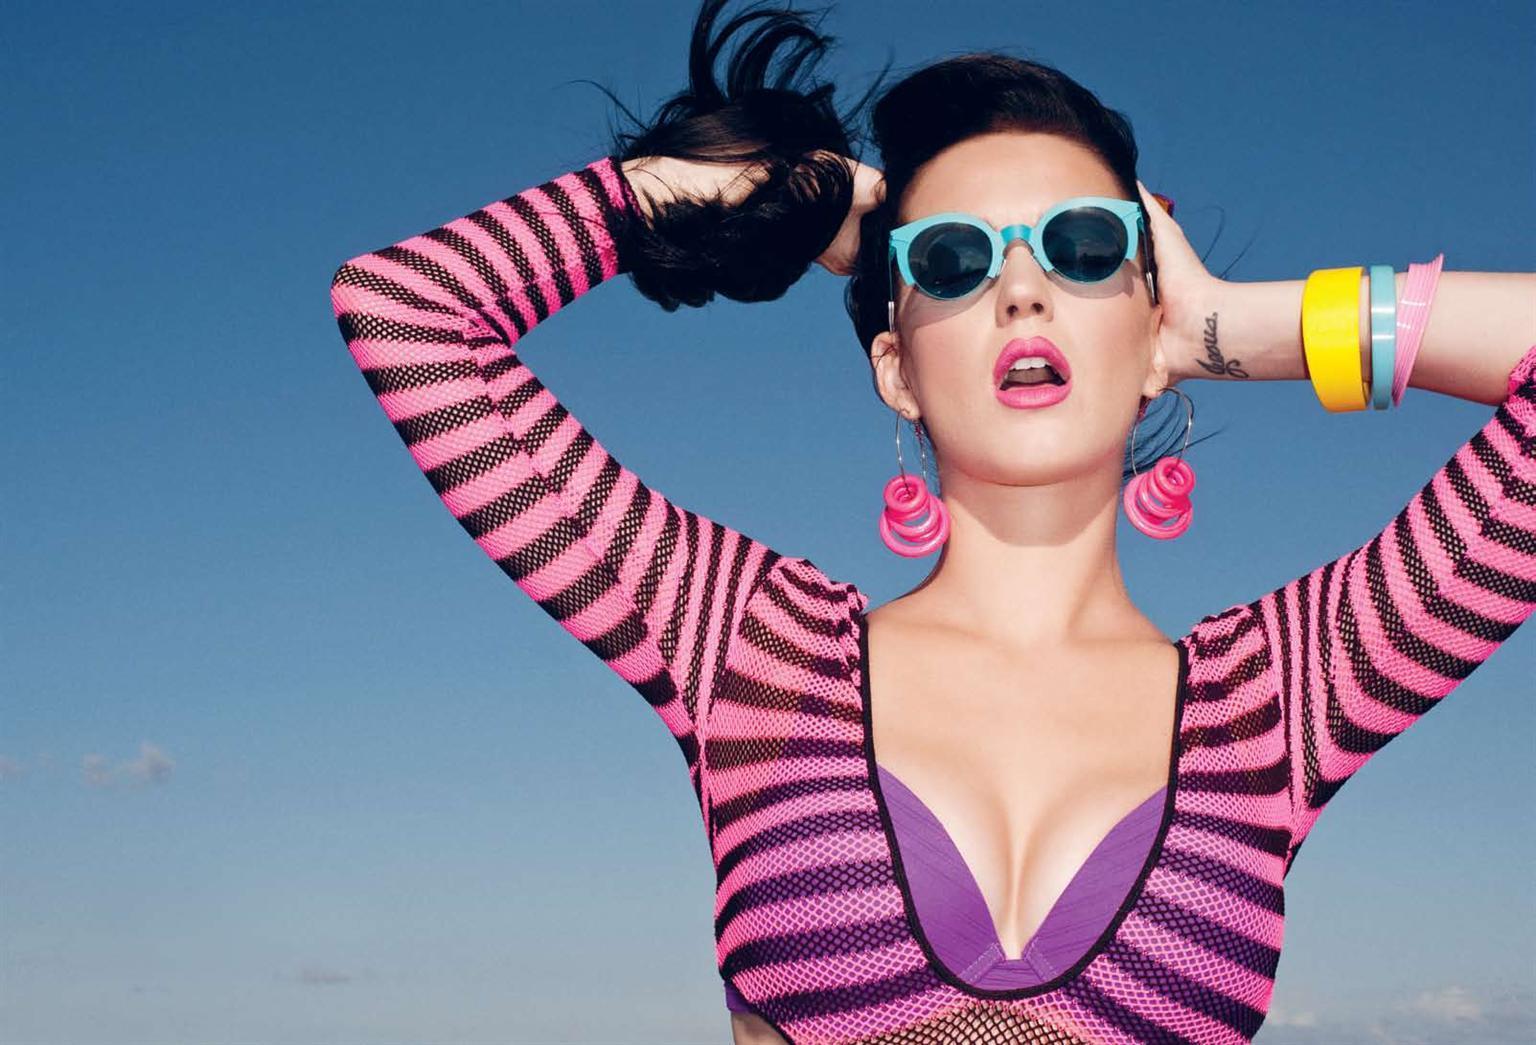 BENDITO DRINK POP: Veja Katy Perry sensualizando ao vivo com The ...